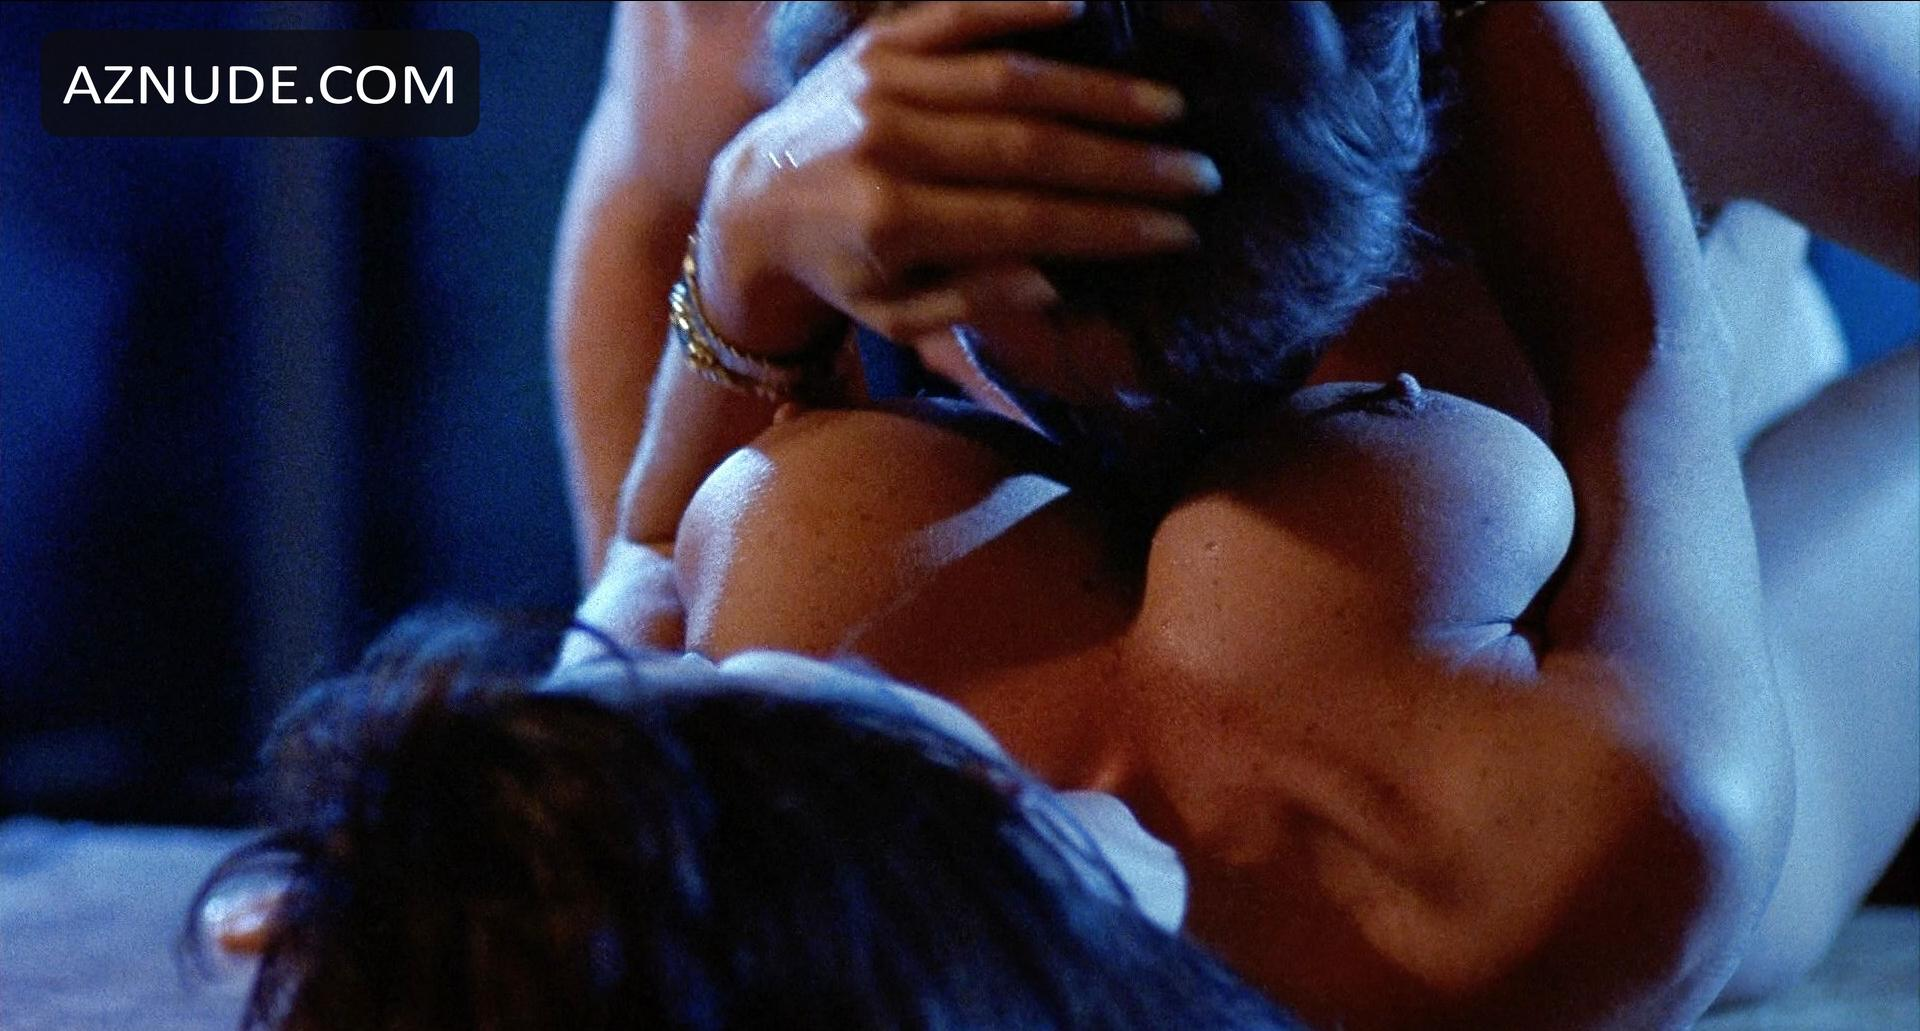 Ava Fabian Porno ava fabian nude - aznude